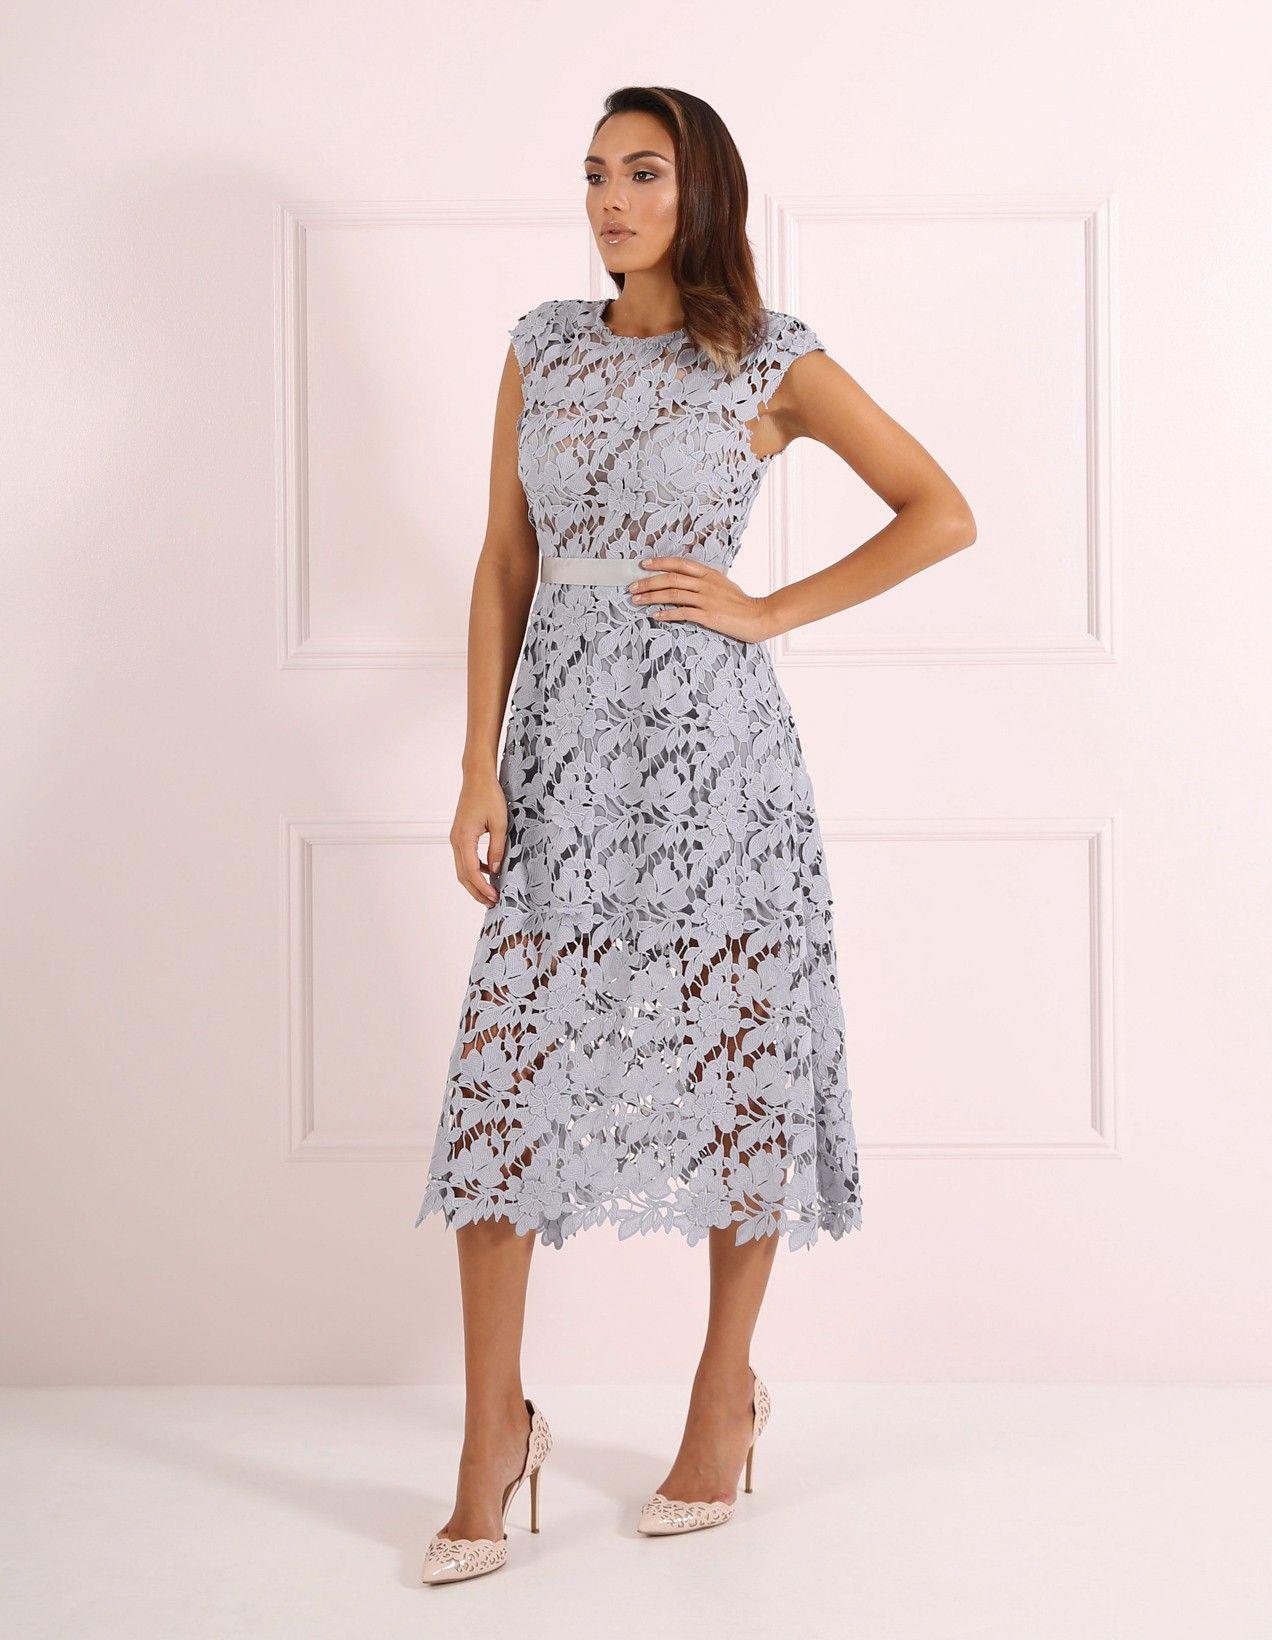 Laila Grey Flowing Lace Midi Dress Wedding Guest Dresses All Forever Unique